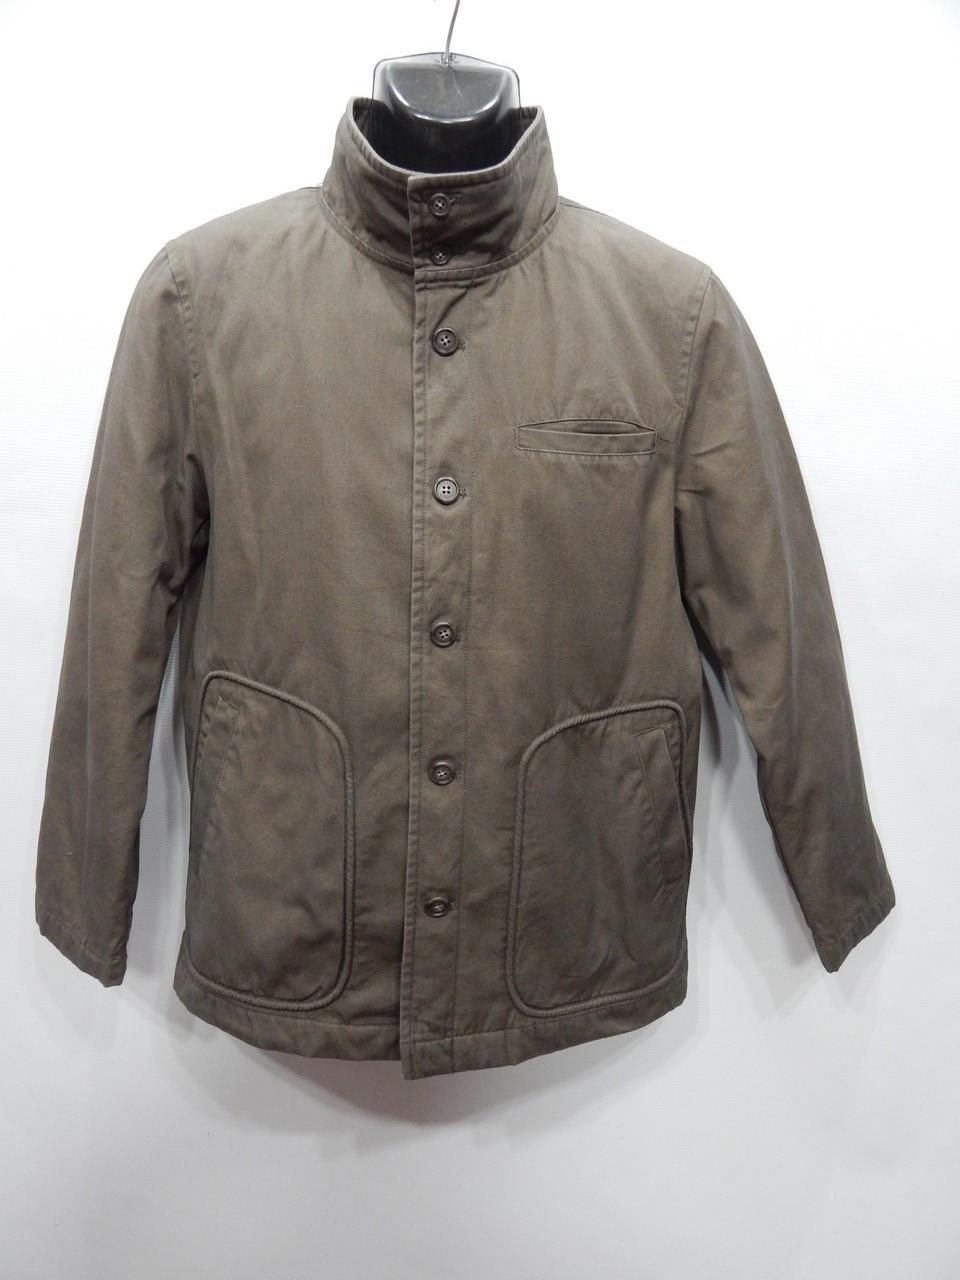 Мужская демисезонная куртка Boycott р.48 288KMD